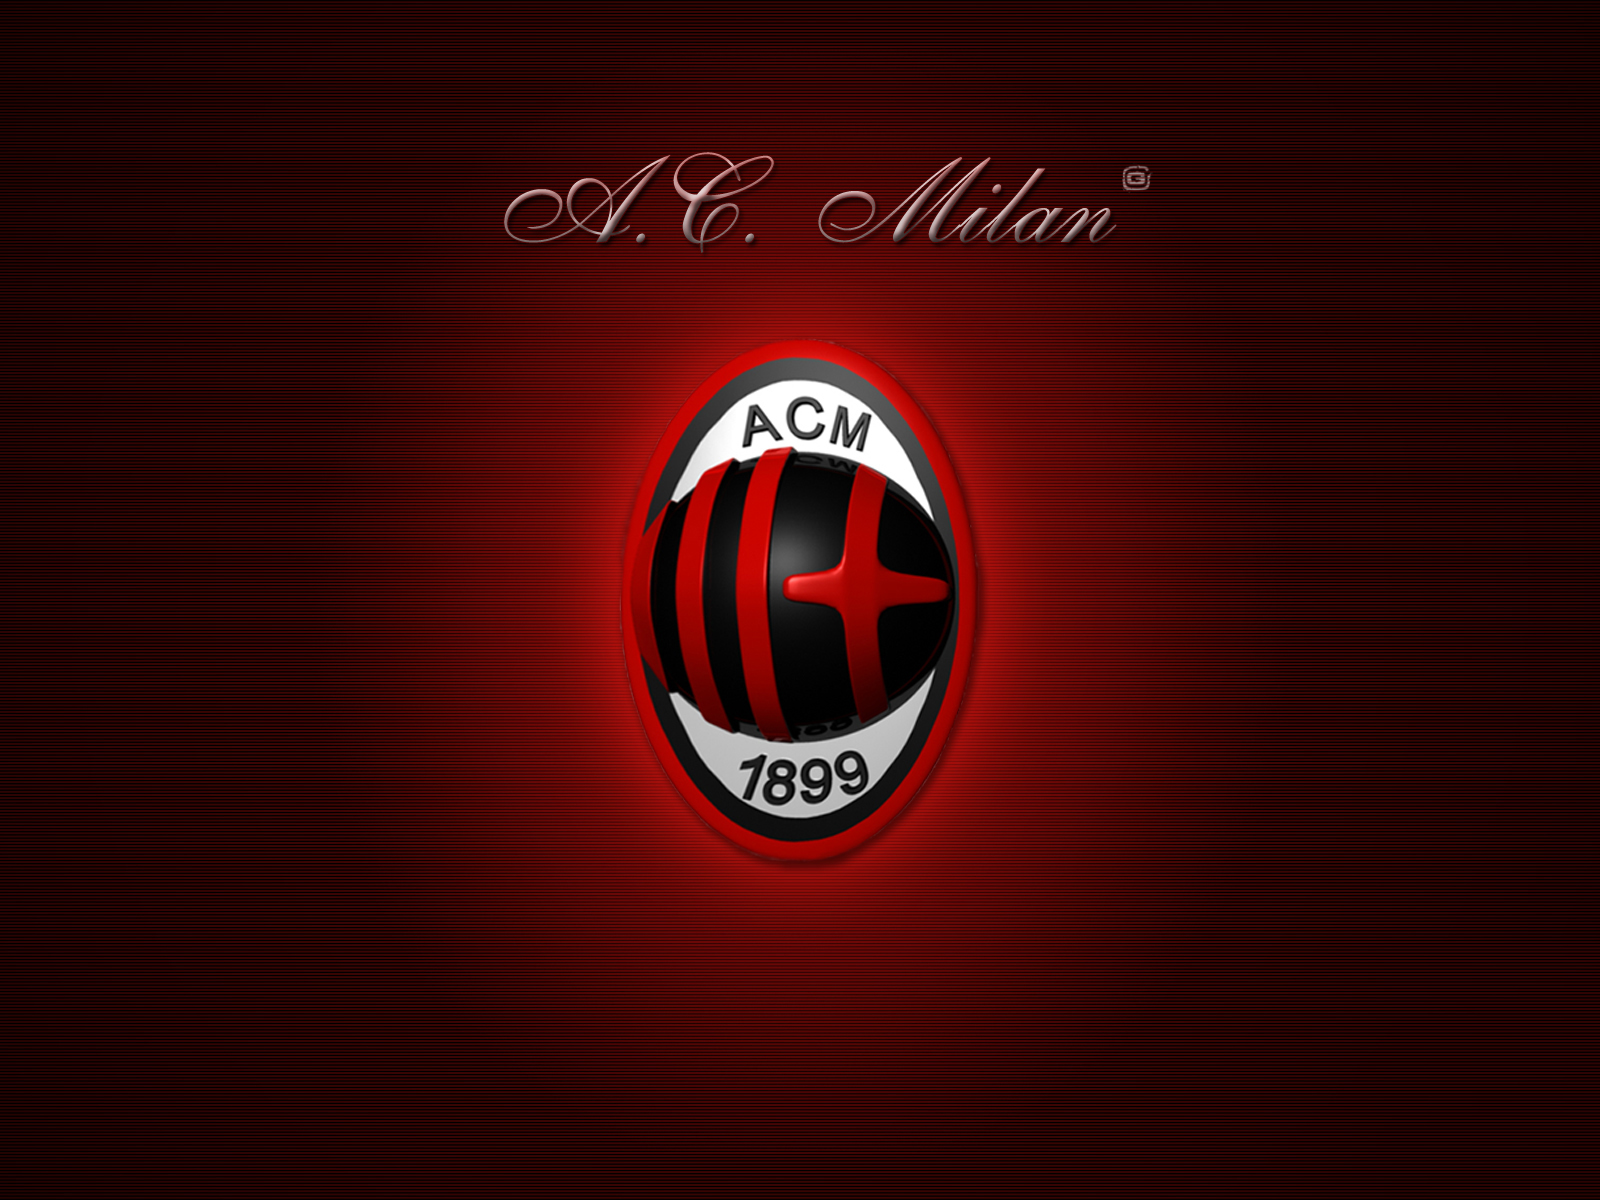 Ricardo Kaka Hd Wallpapers Ac Milan Logo Wallpapers Hd Collection Free Download